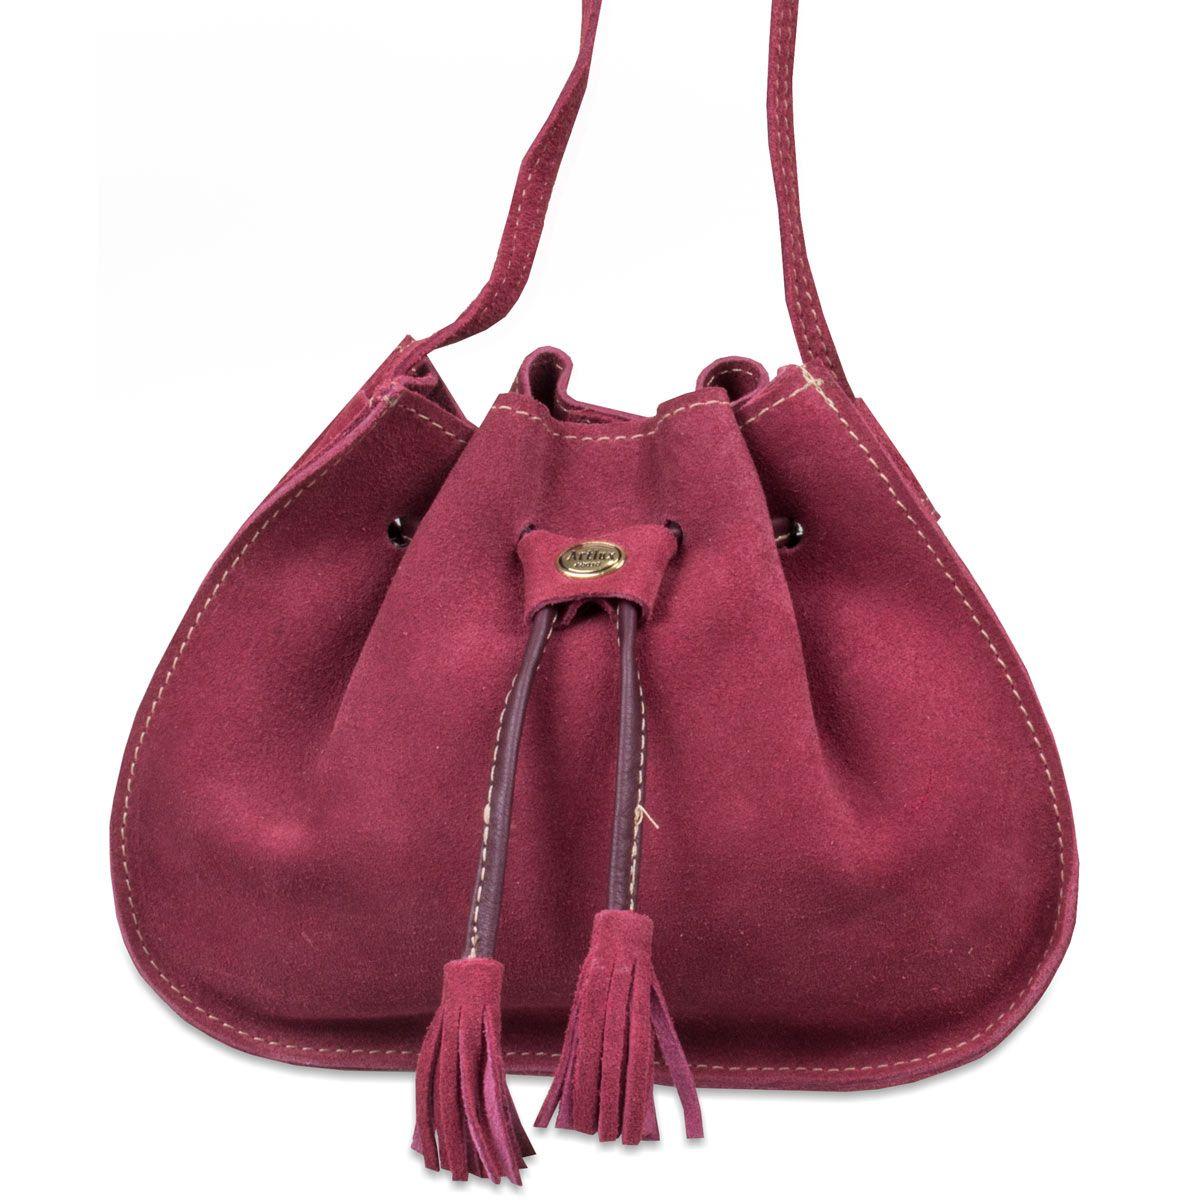 Bolsa Saco Couro Feminina Artlux  1c512ee1001